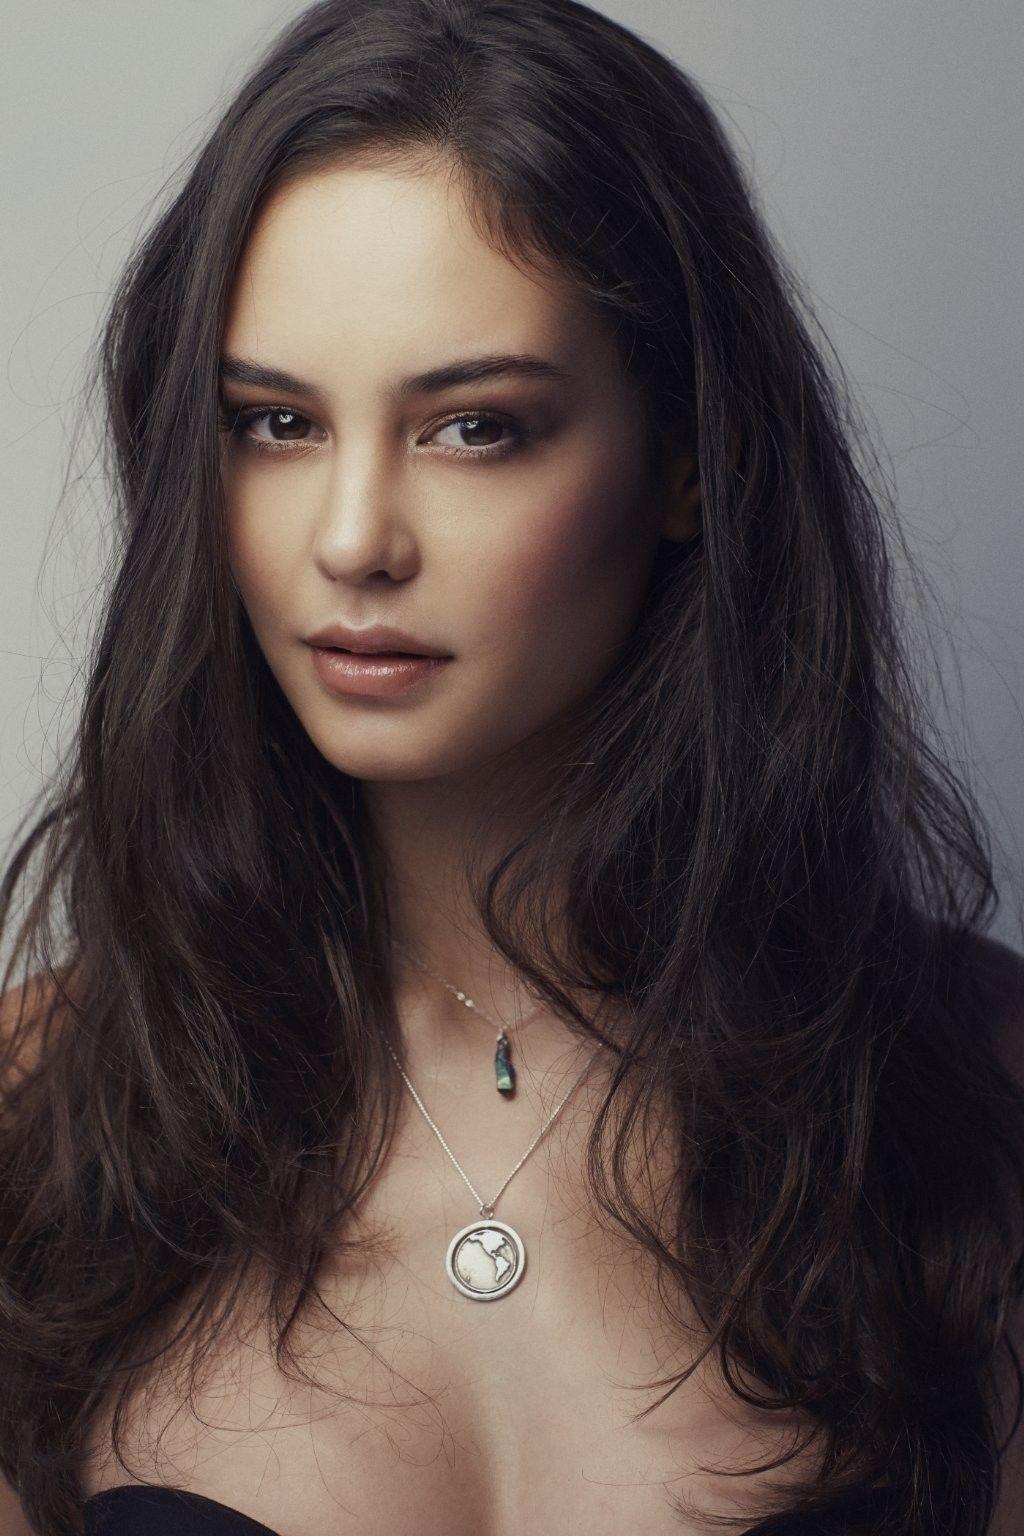 Pin De Jake Archon En Photography En 2019 Belleza Morena Retrato